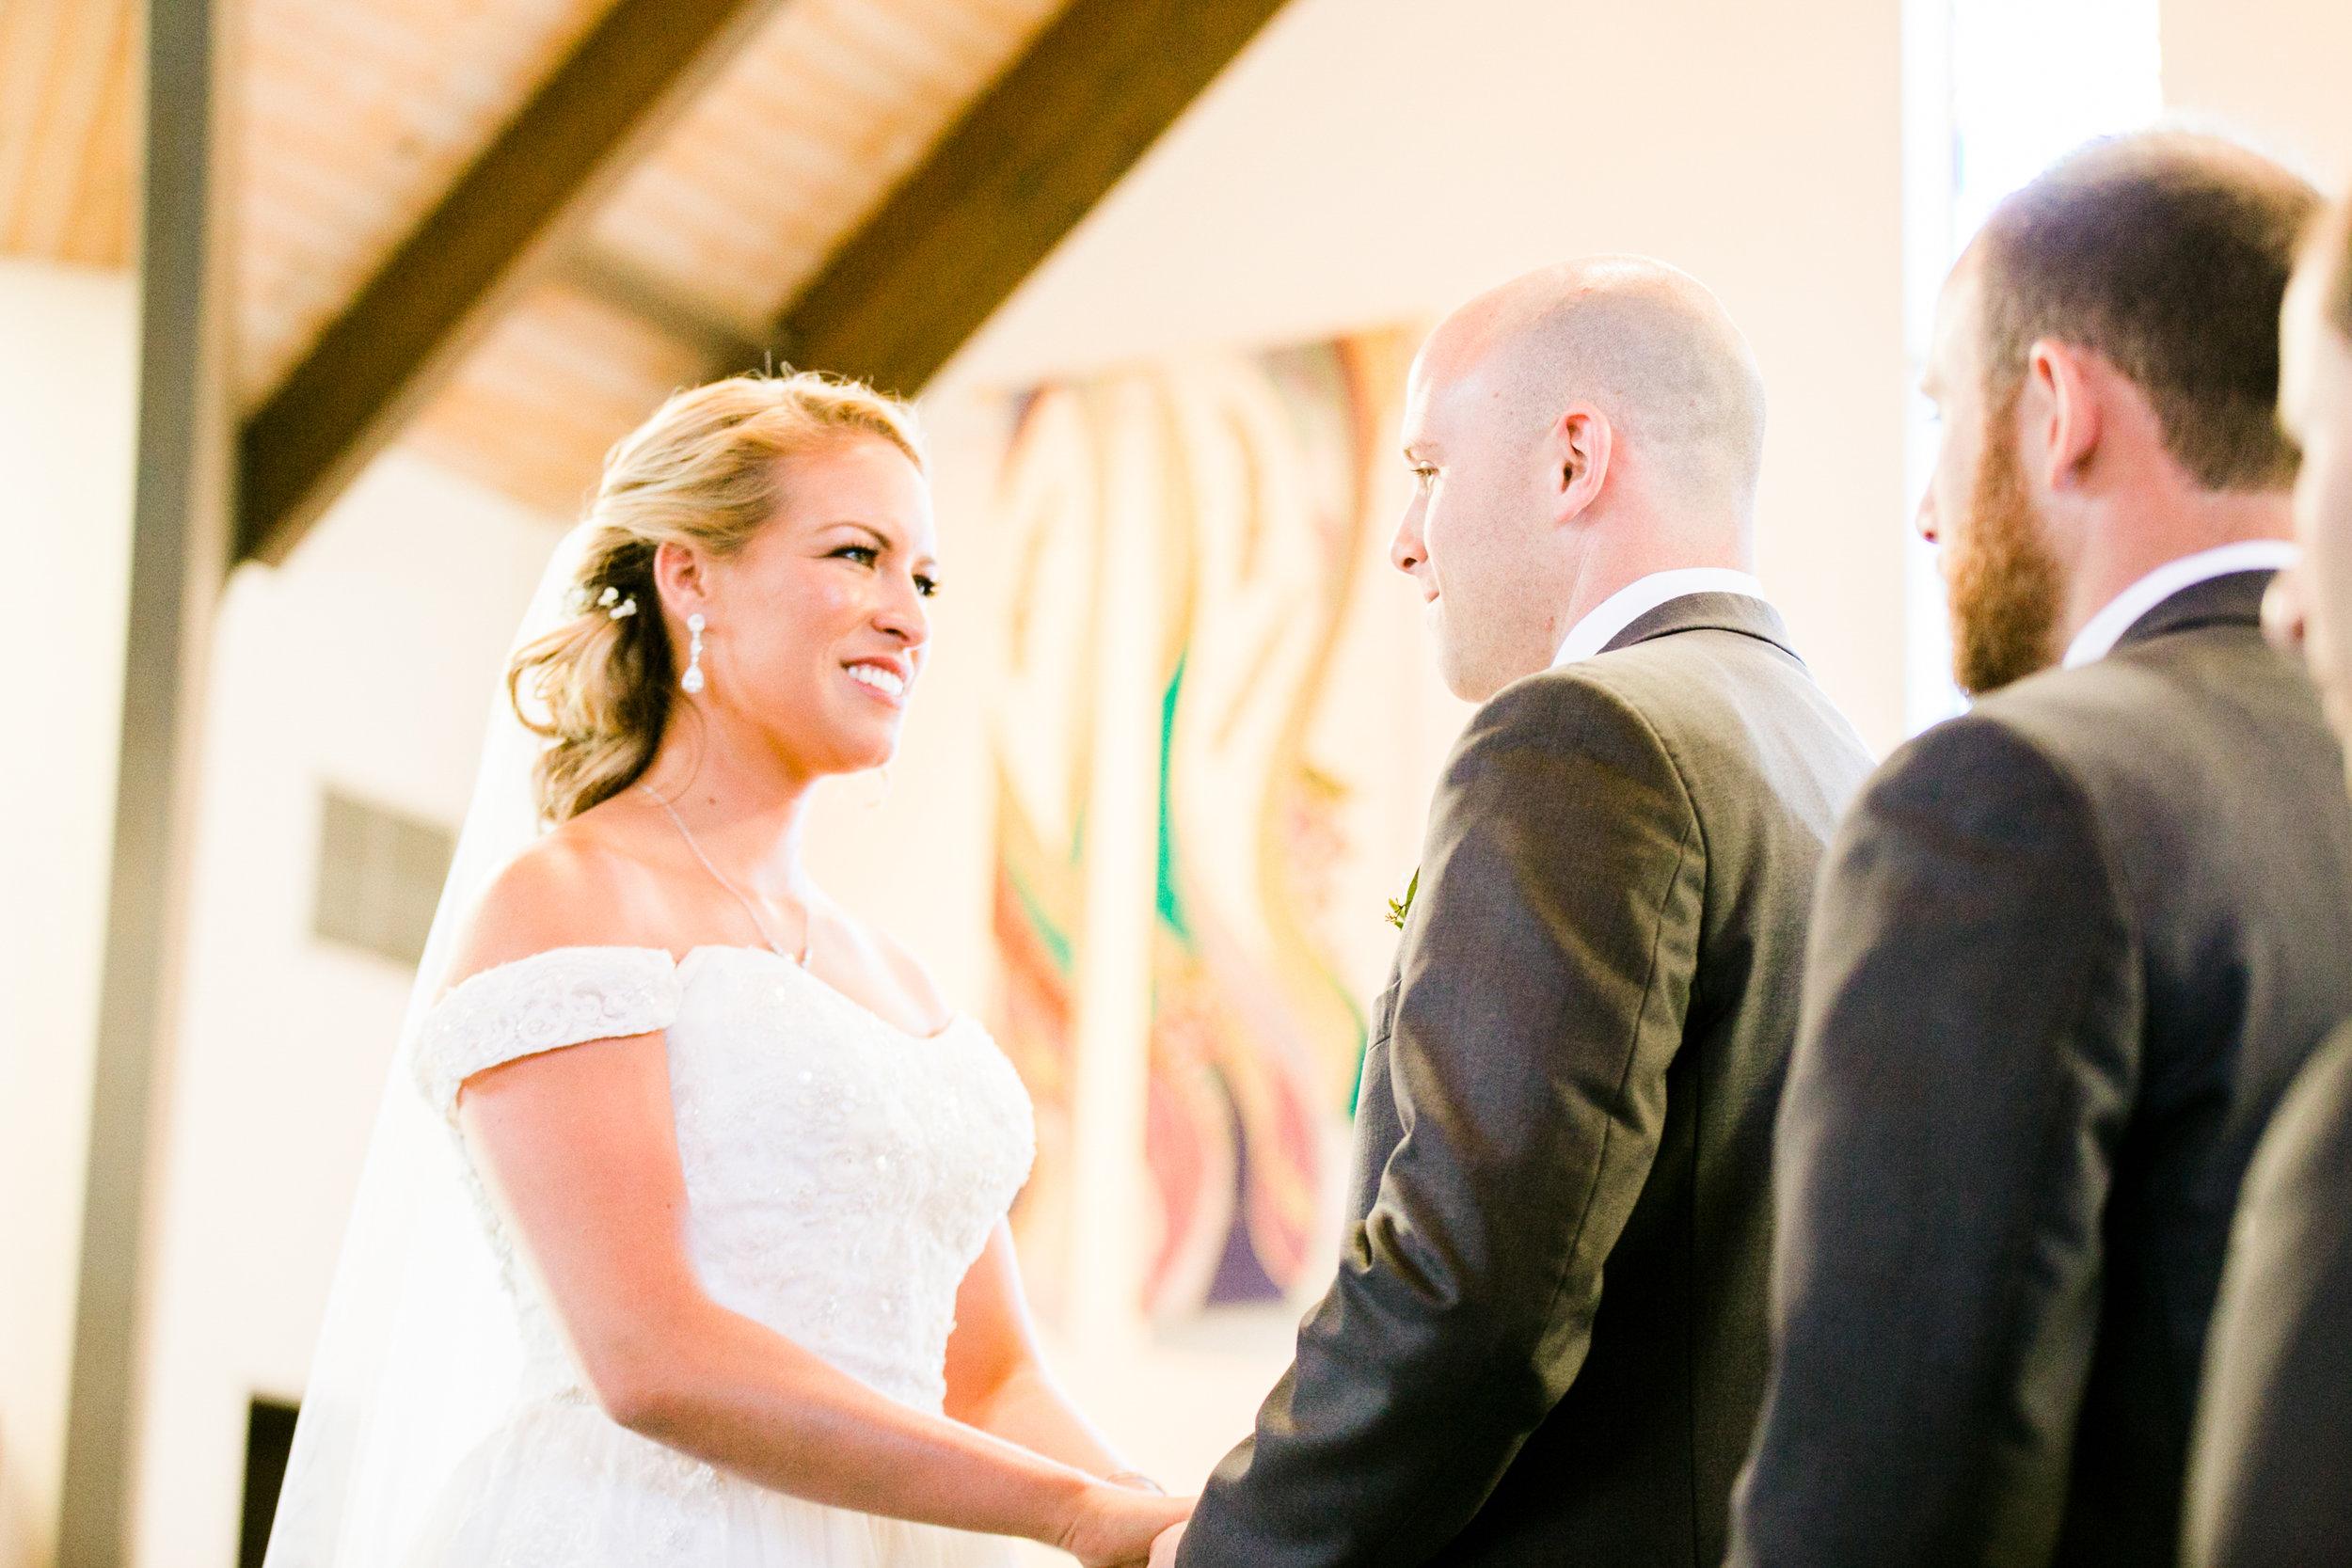 ICONA GOLDEN INN AVALON NJ WEDDING PHOTOGRAPHY  - 047.jpg